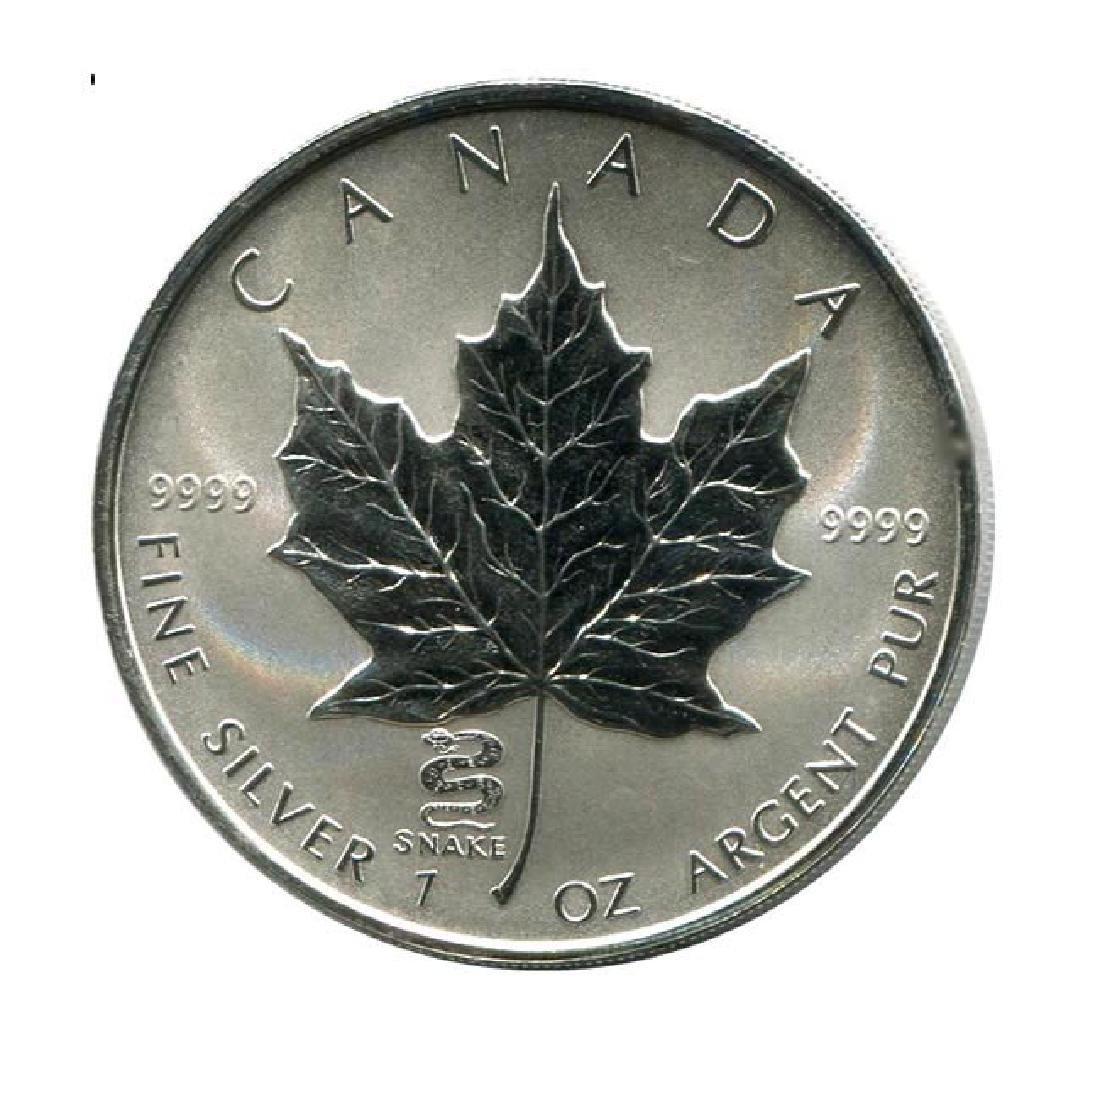 2001 Canada 1 oz. Silver Maple Leaf Reverse Proof Snake